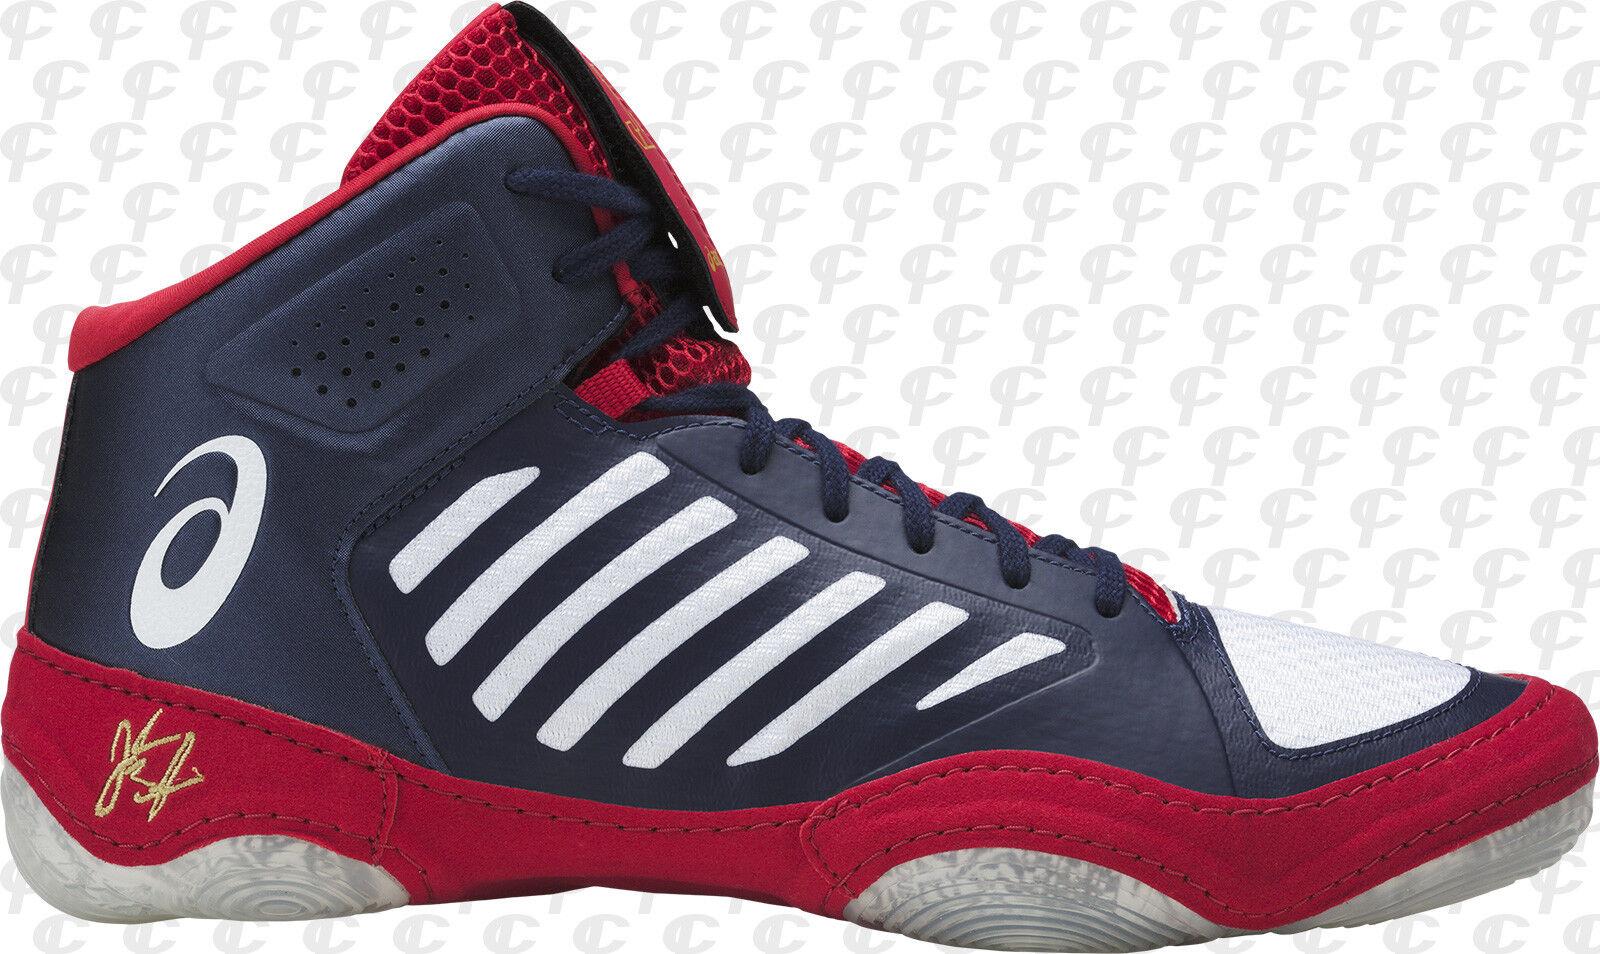 NEW Asics JB Elite III Wrestling Shoes Adult US Sizes J702N-4901 Blue/White/Red